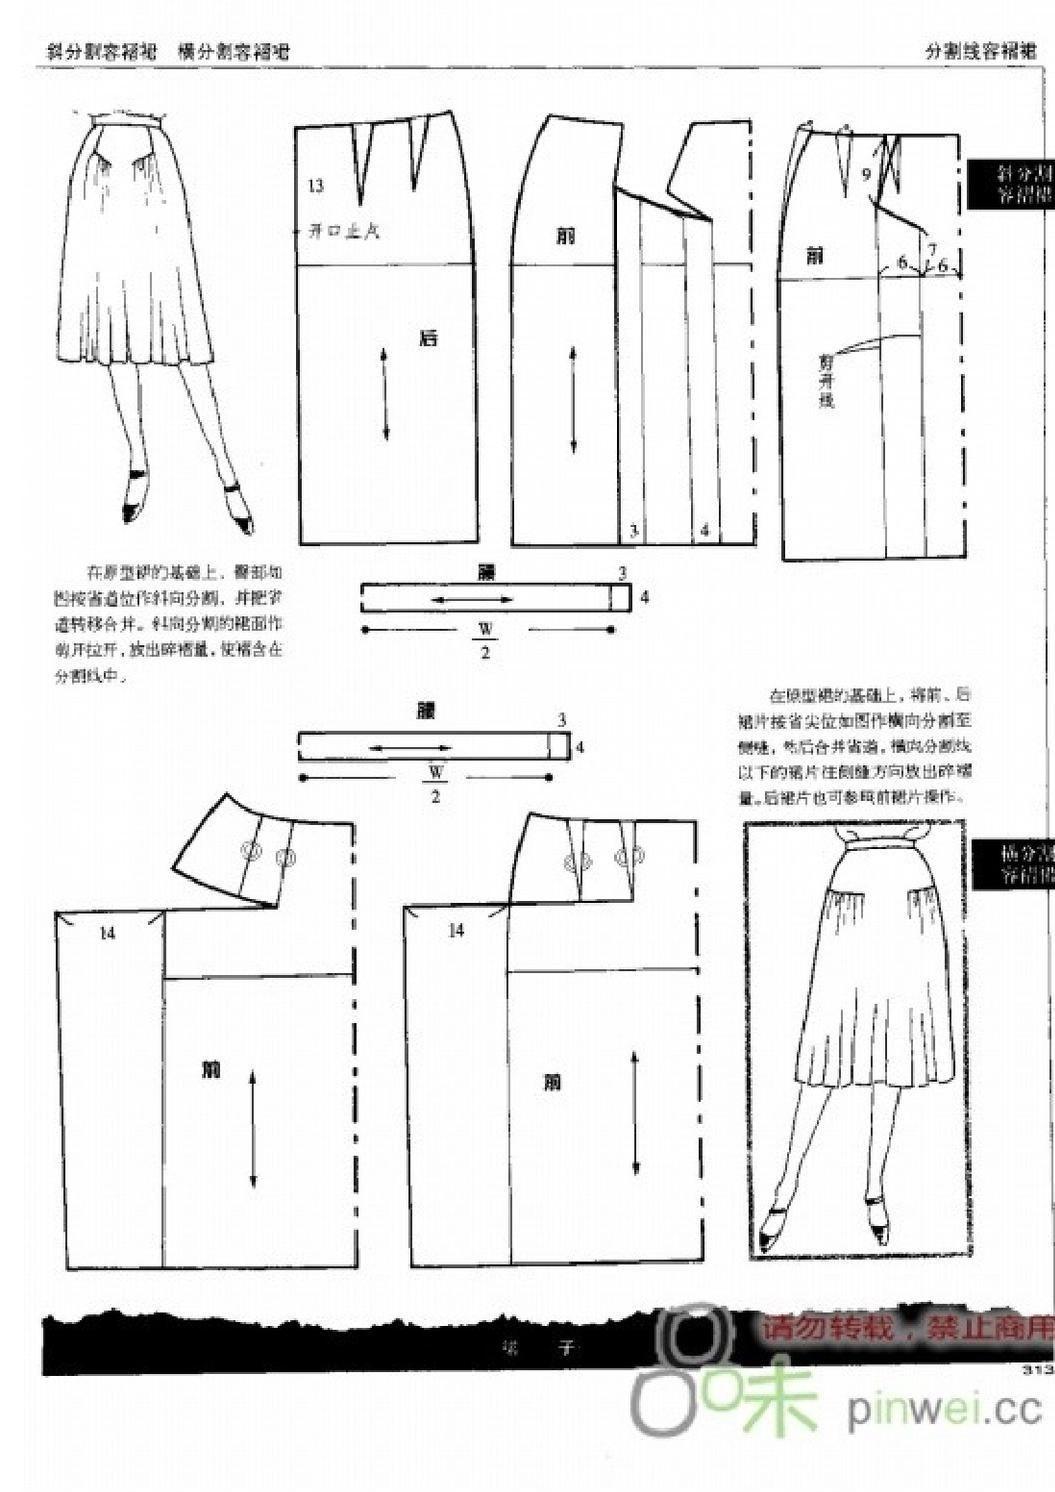 fabric0027 | etek çizimi | Pinterest | Costura, Patron falda y Patrones